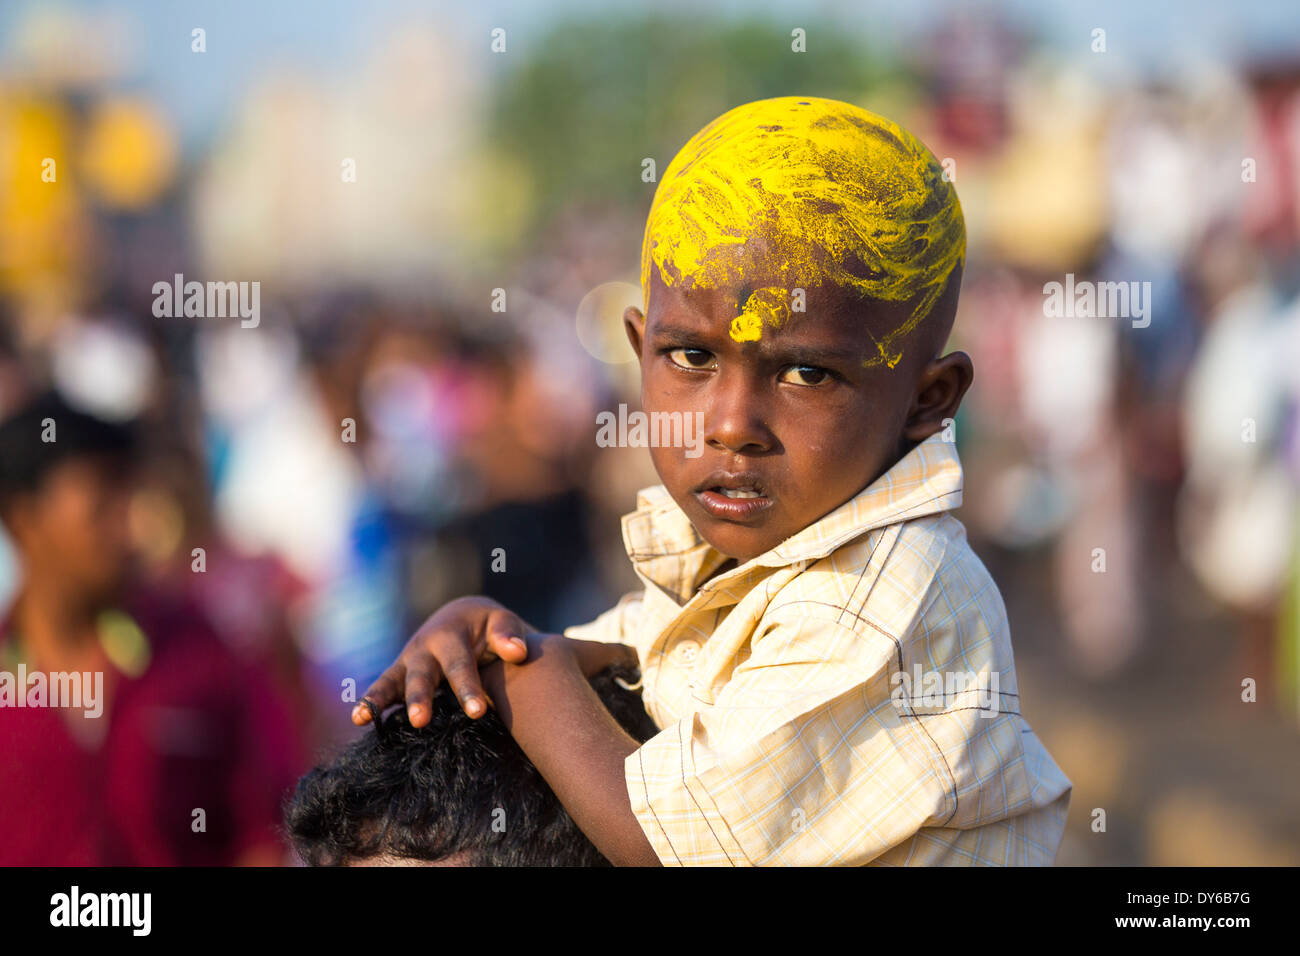 Boy rides on shoulders during Chithirai Thiruvizha Hindu Festival, Madurai, India - Stock Image